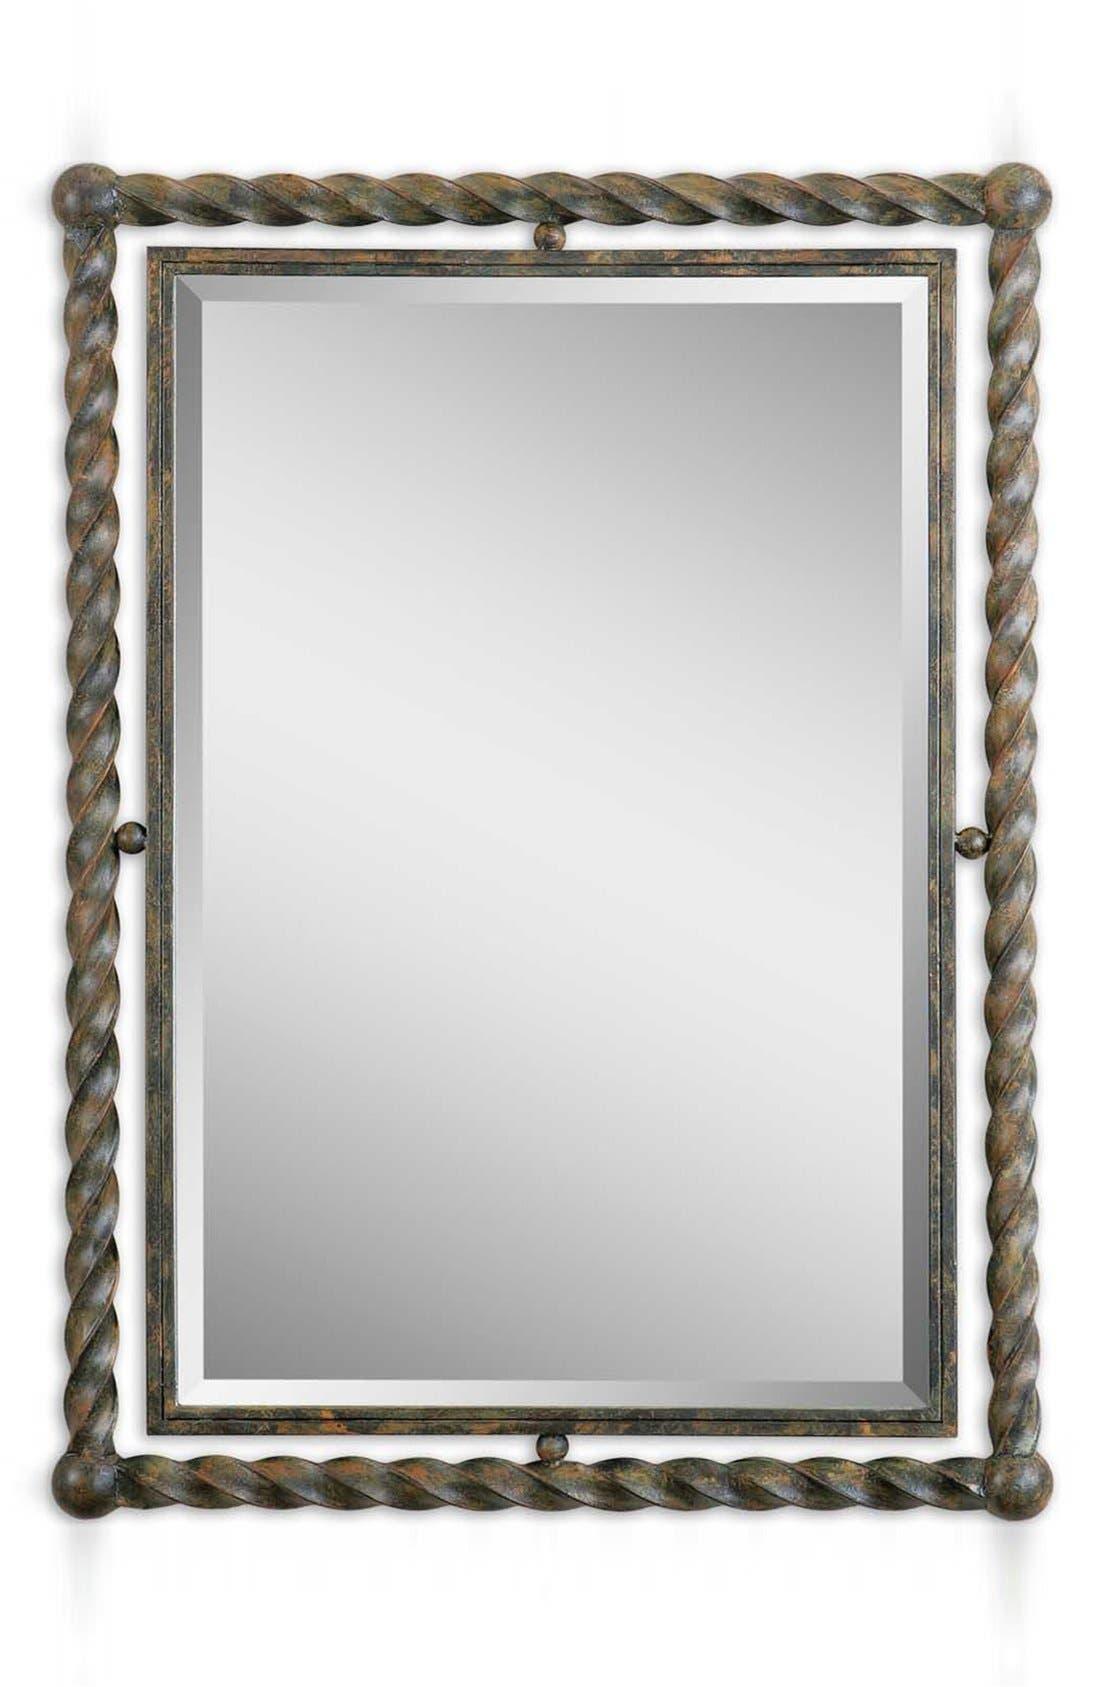 Uttermost 'Garrick' Wrought Iron Mirror